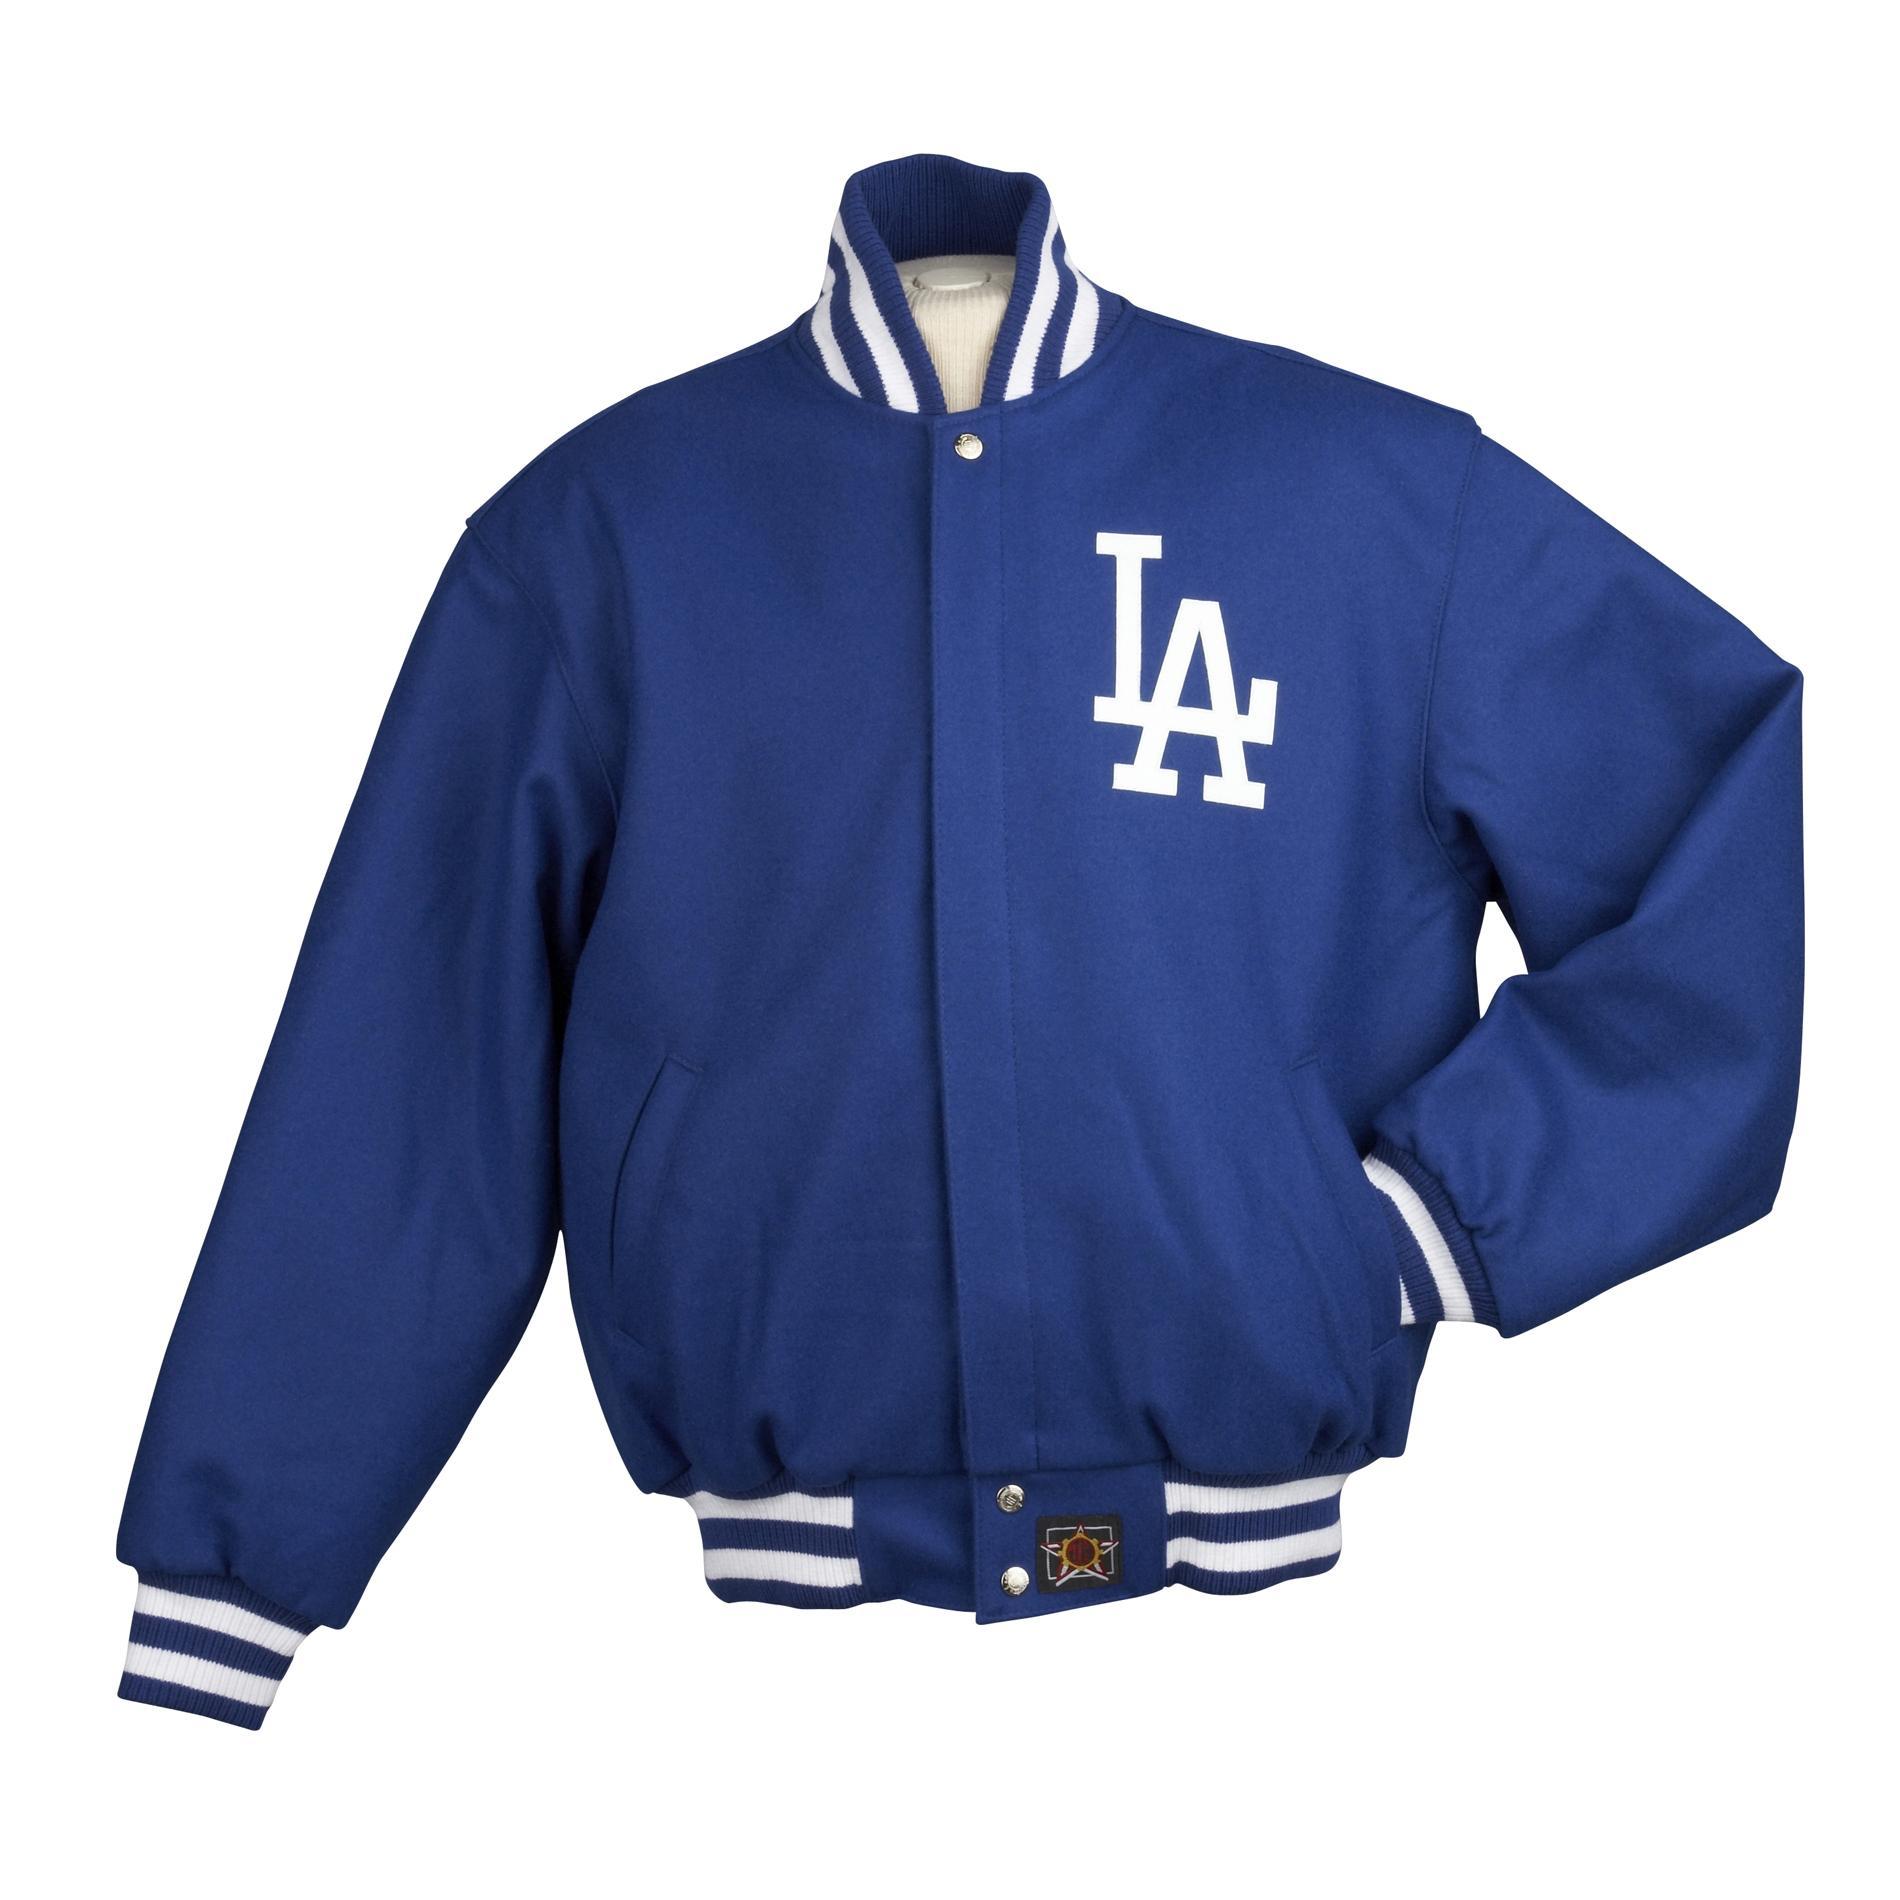 JH Designs Men's Los Angeles Dodgers Domestic Wool Jacket